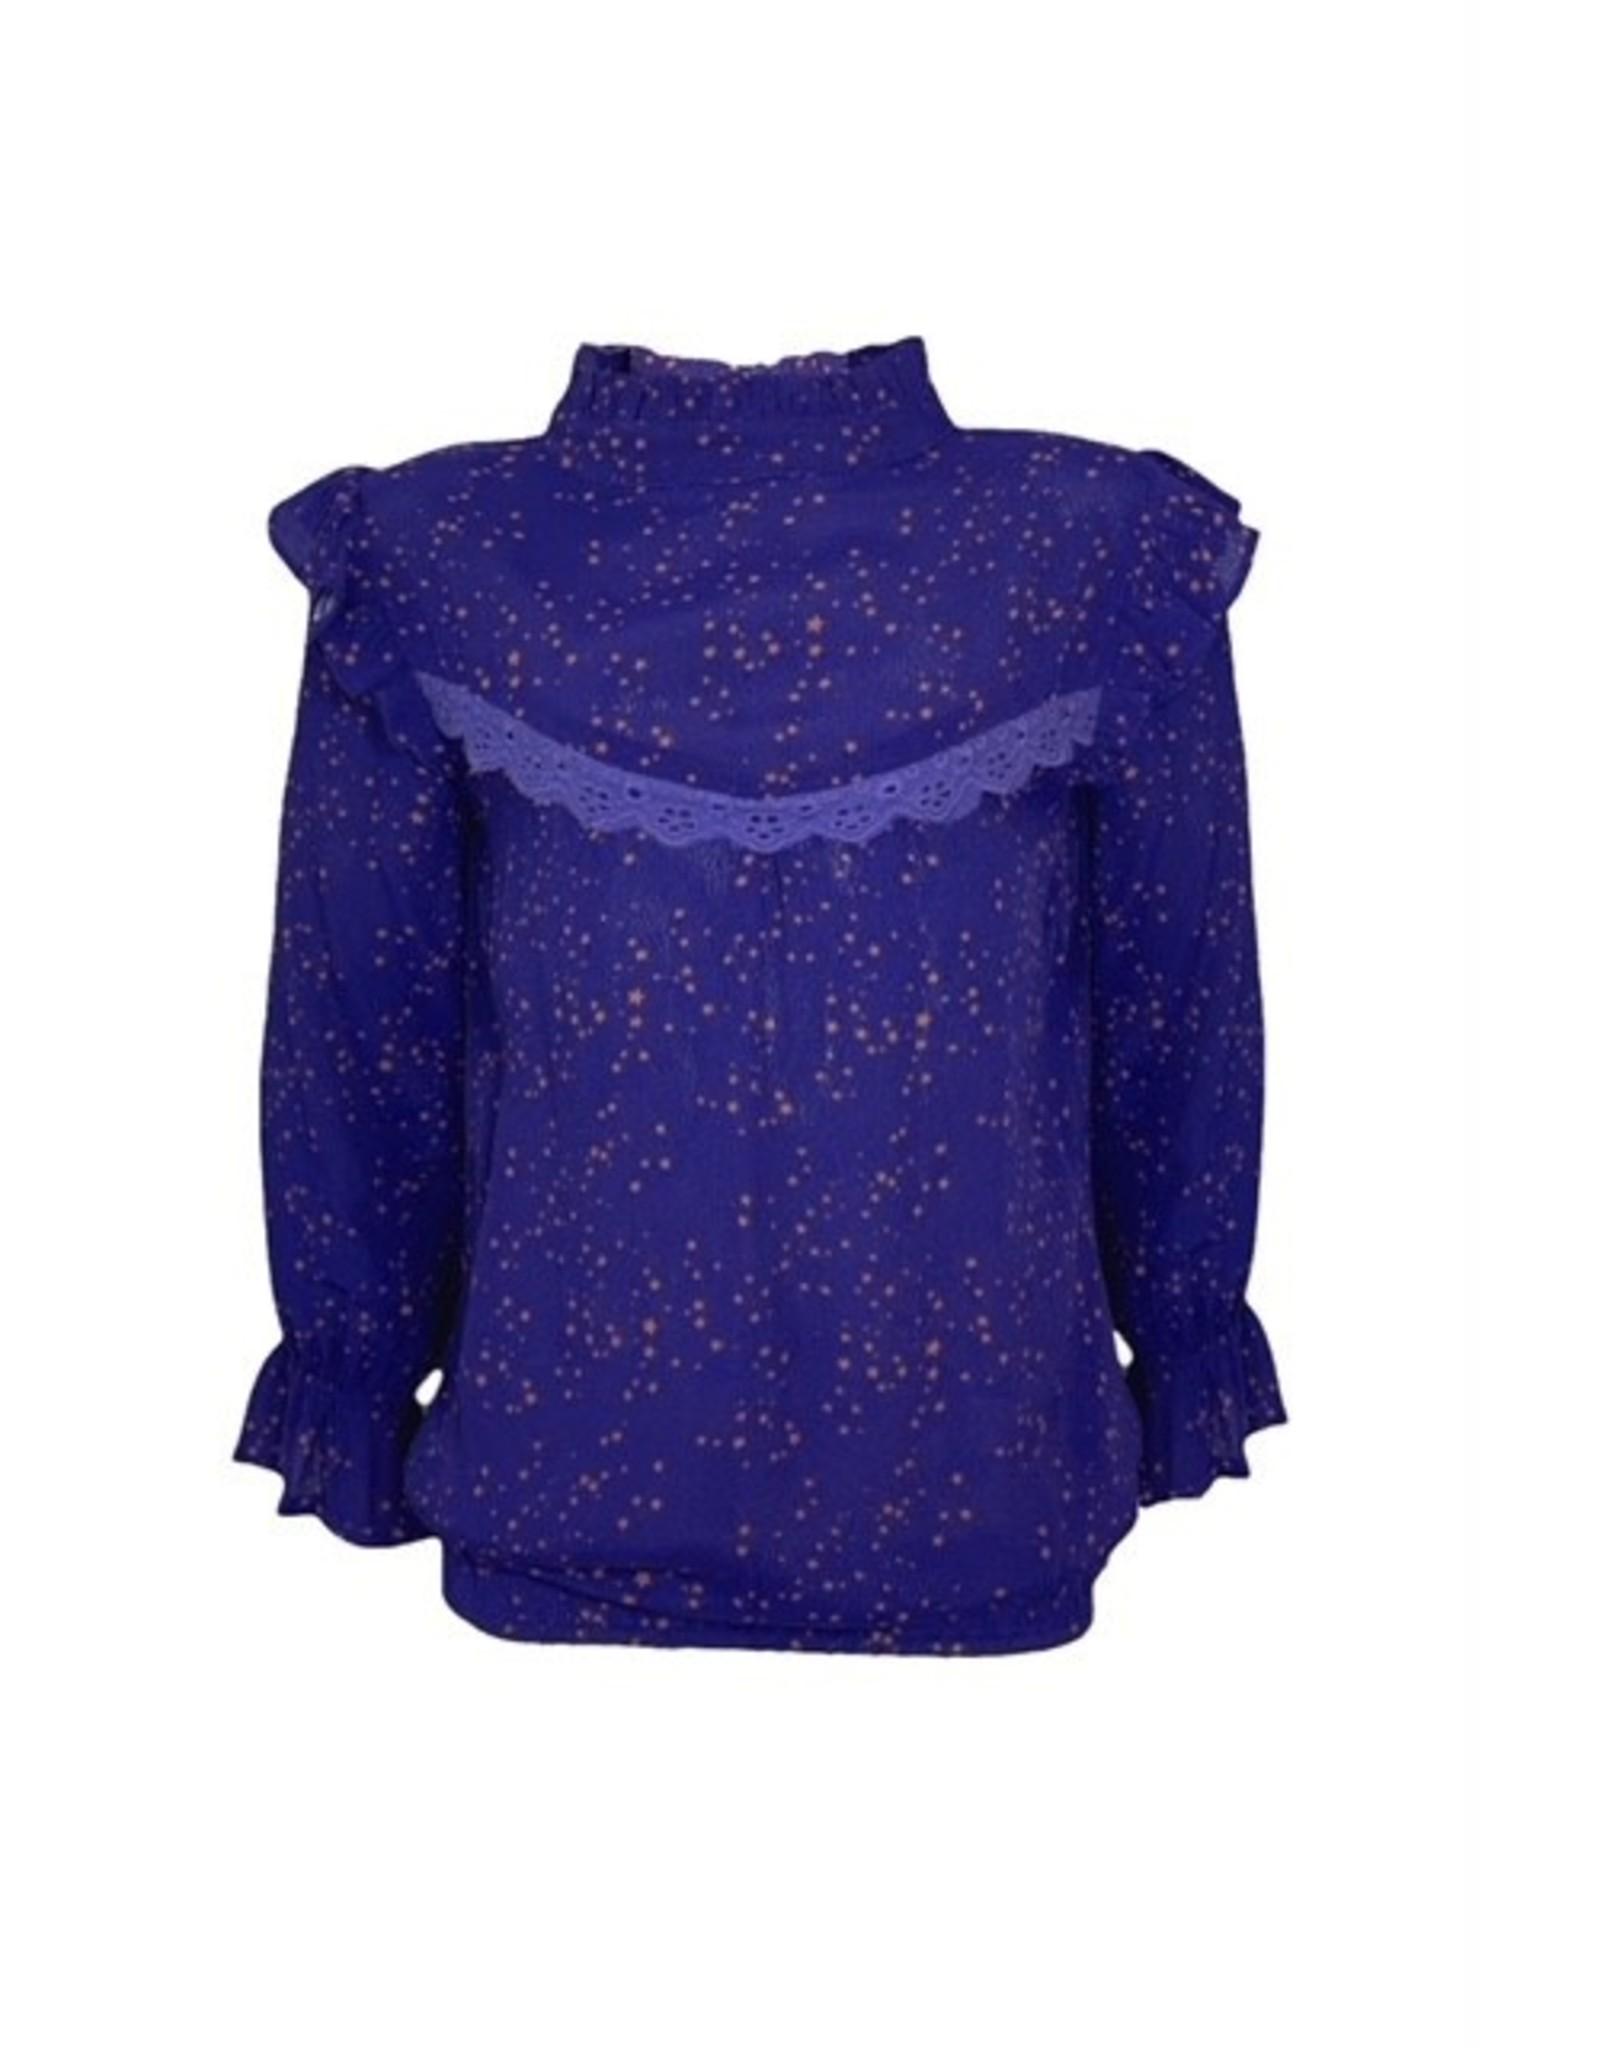 Topitm TOPitm blouse Charlotte cobalt/star